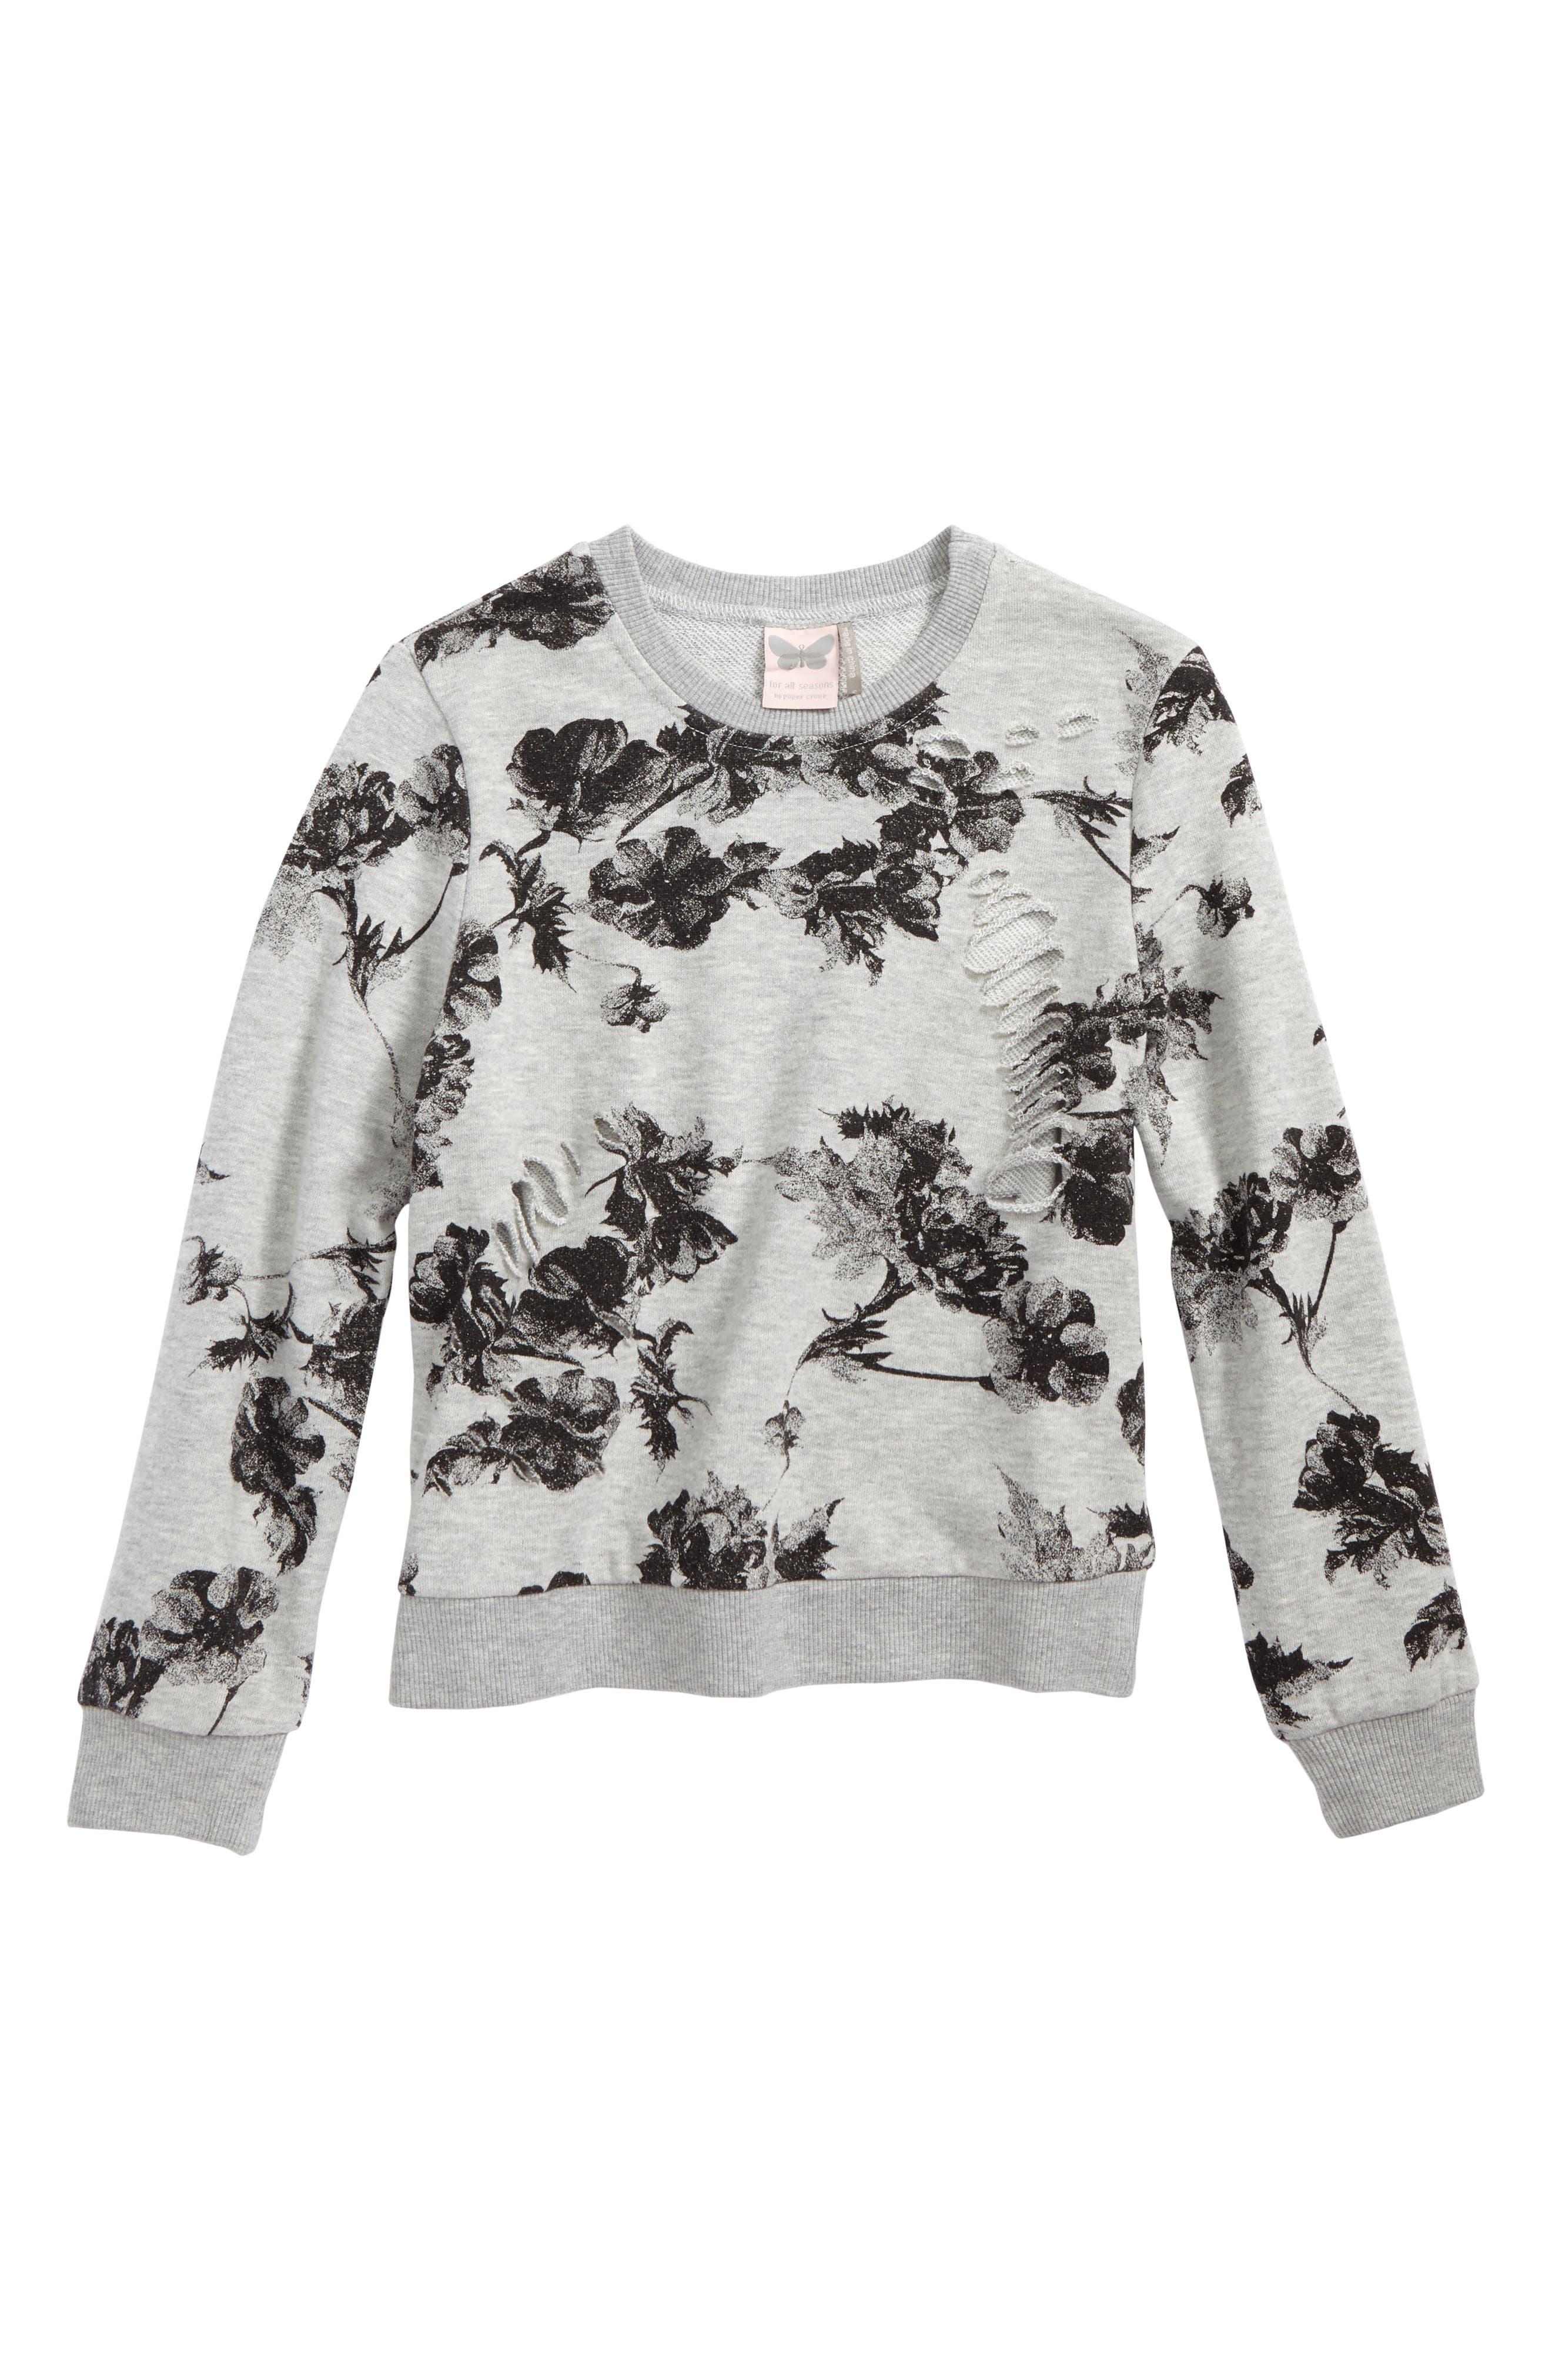 For All Seasons Floral Print Sweatshirt (Big Girls)